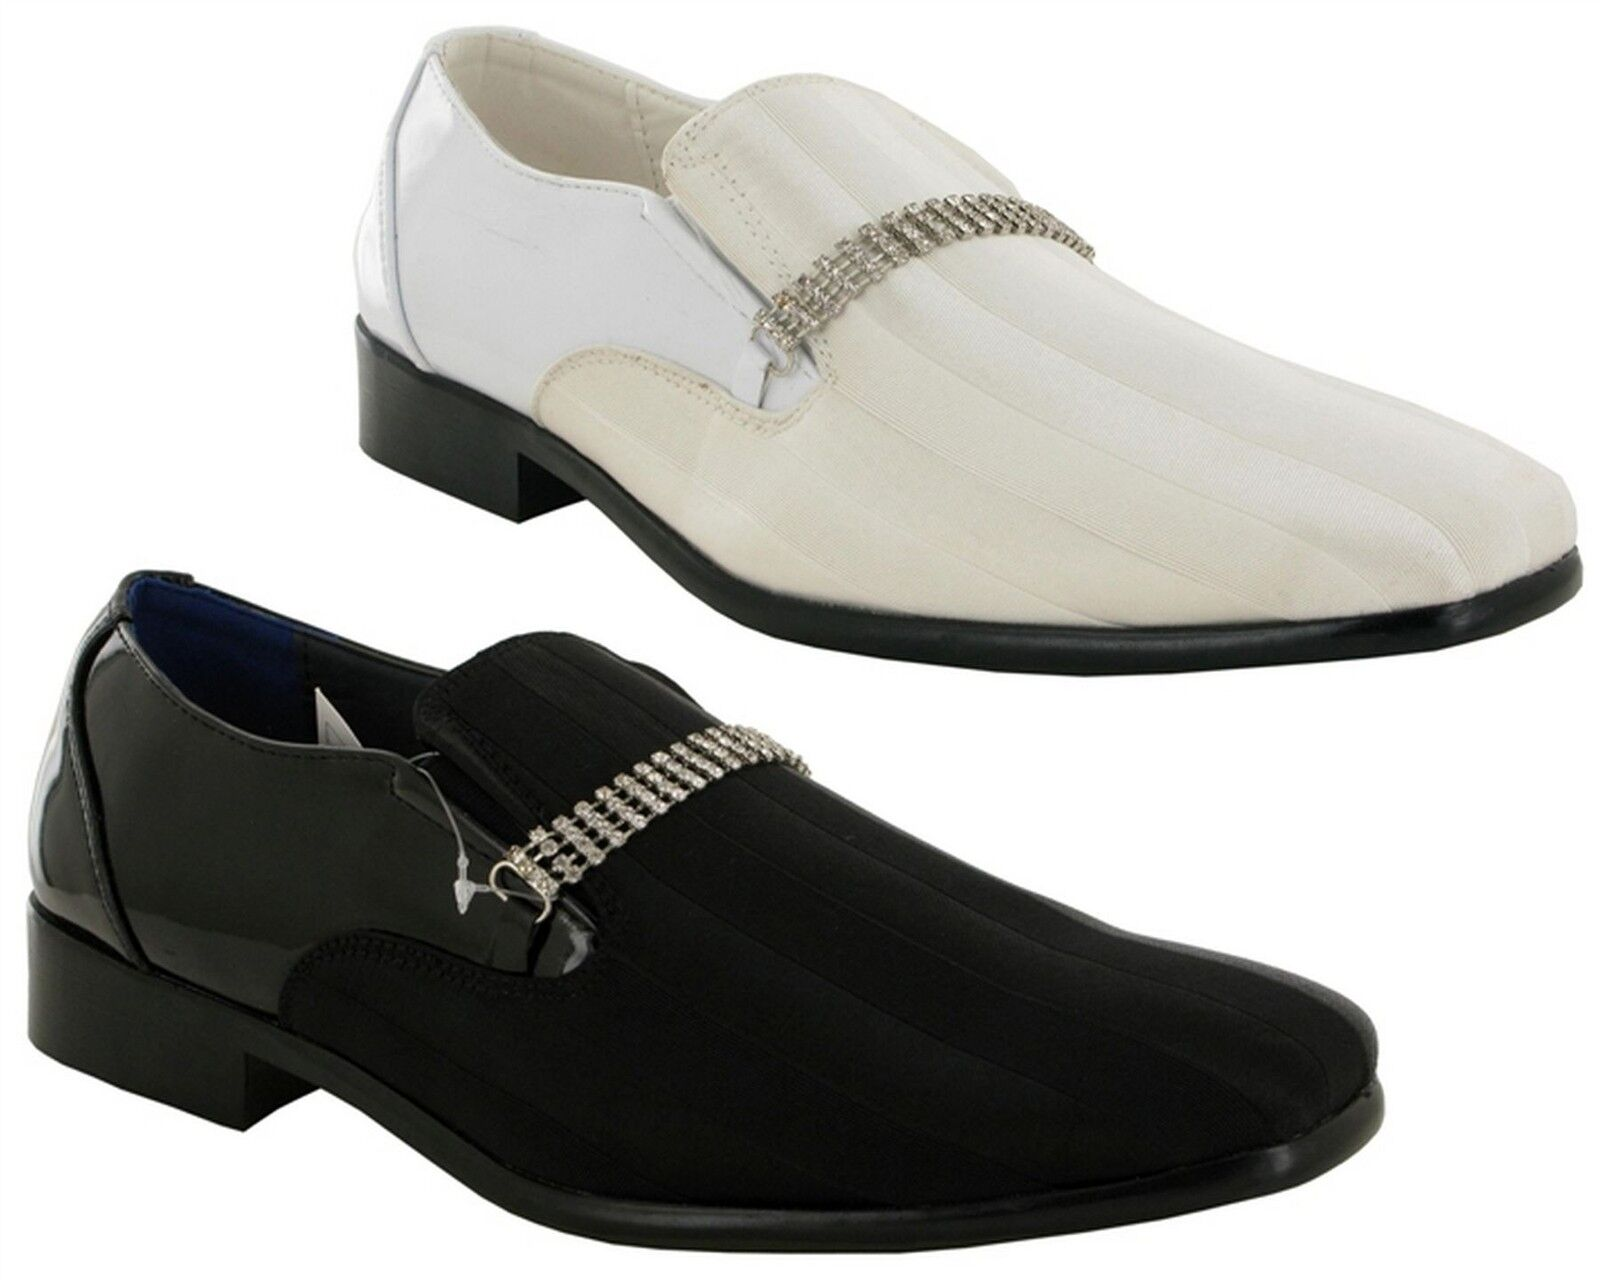 Mens New Wedding Slip On Patent Smart Wedding New Dress Chain Trim Formal Shoes Size 6-11 211e92